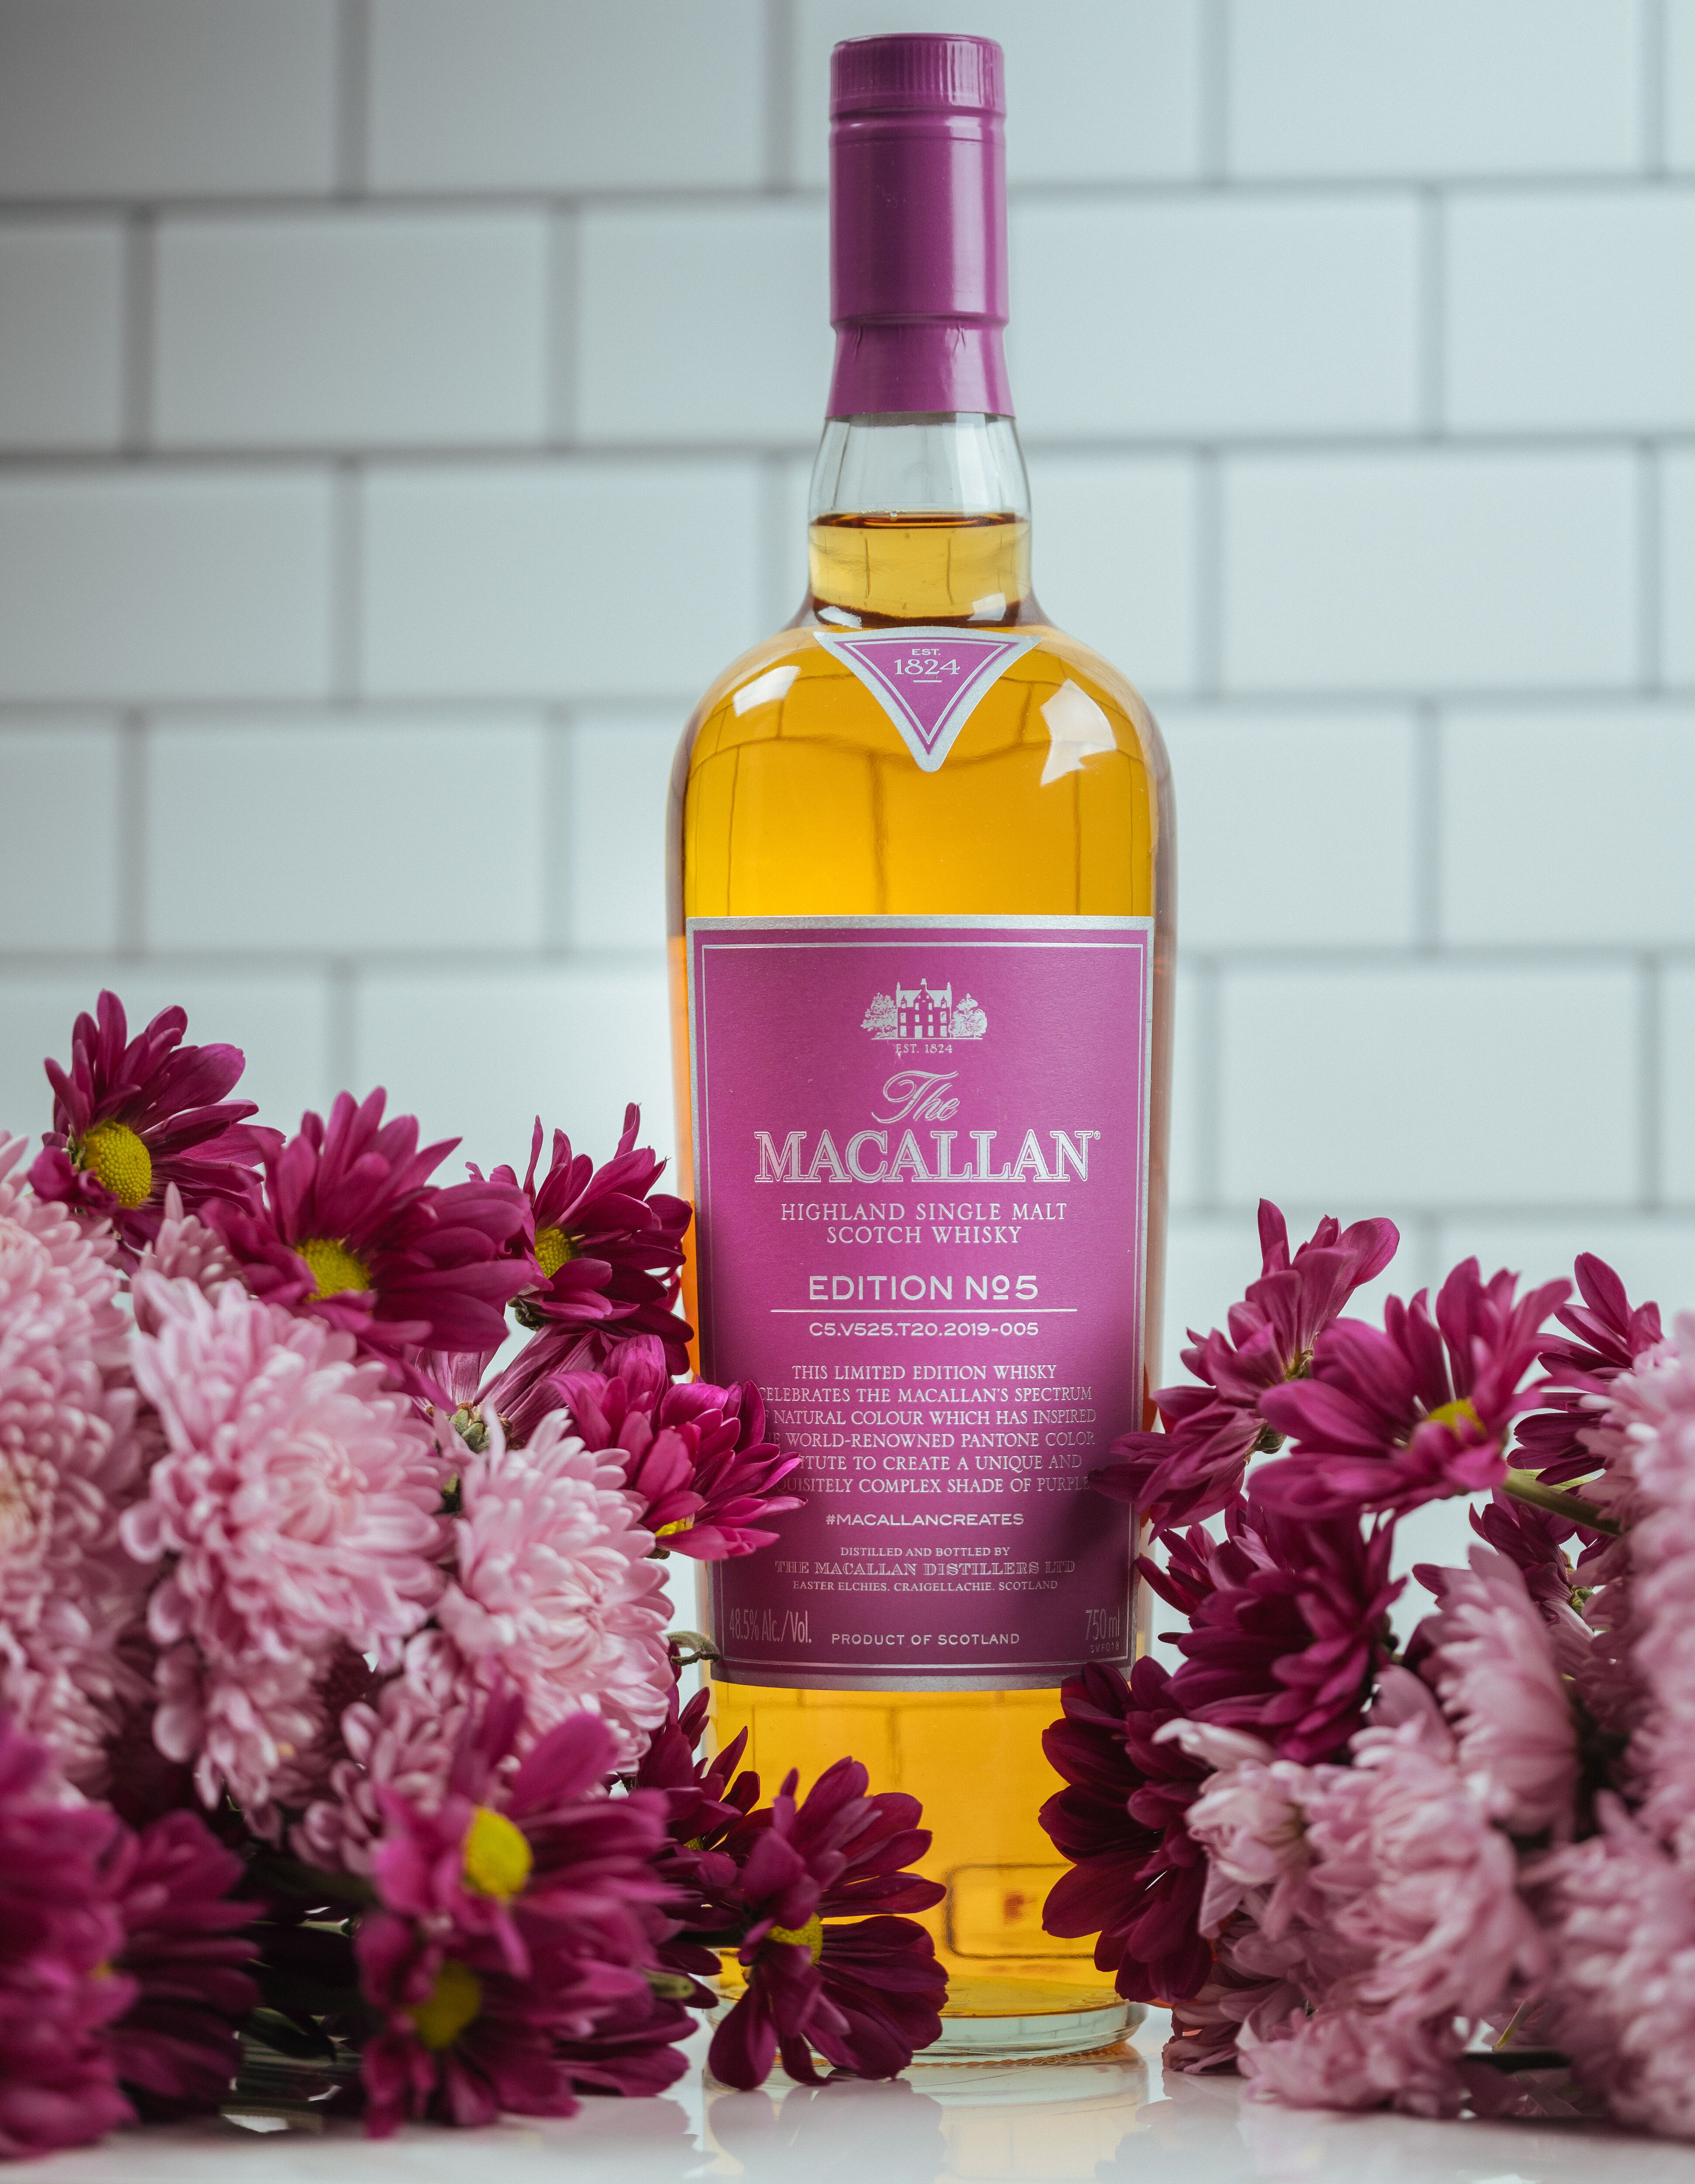 The Macallan edition no.5 nylansering ny whiskylansering November 2019